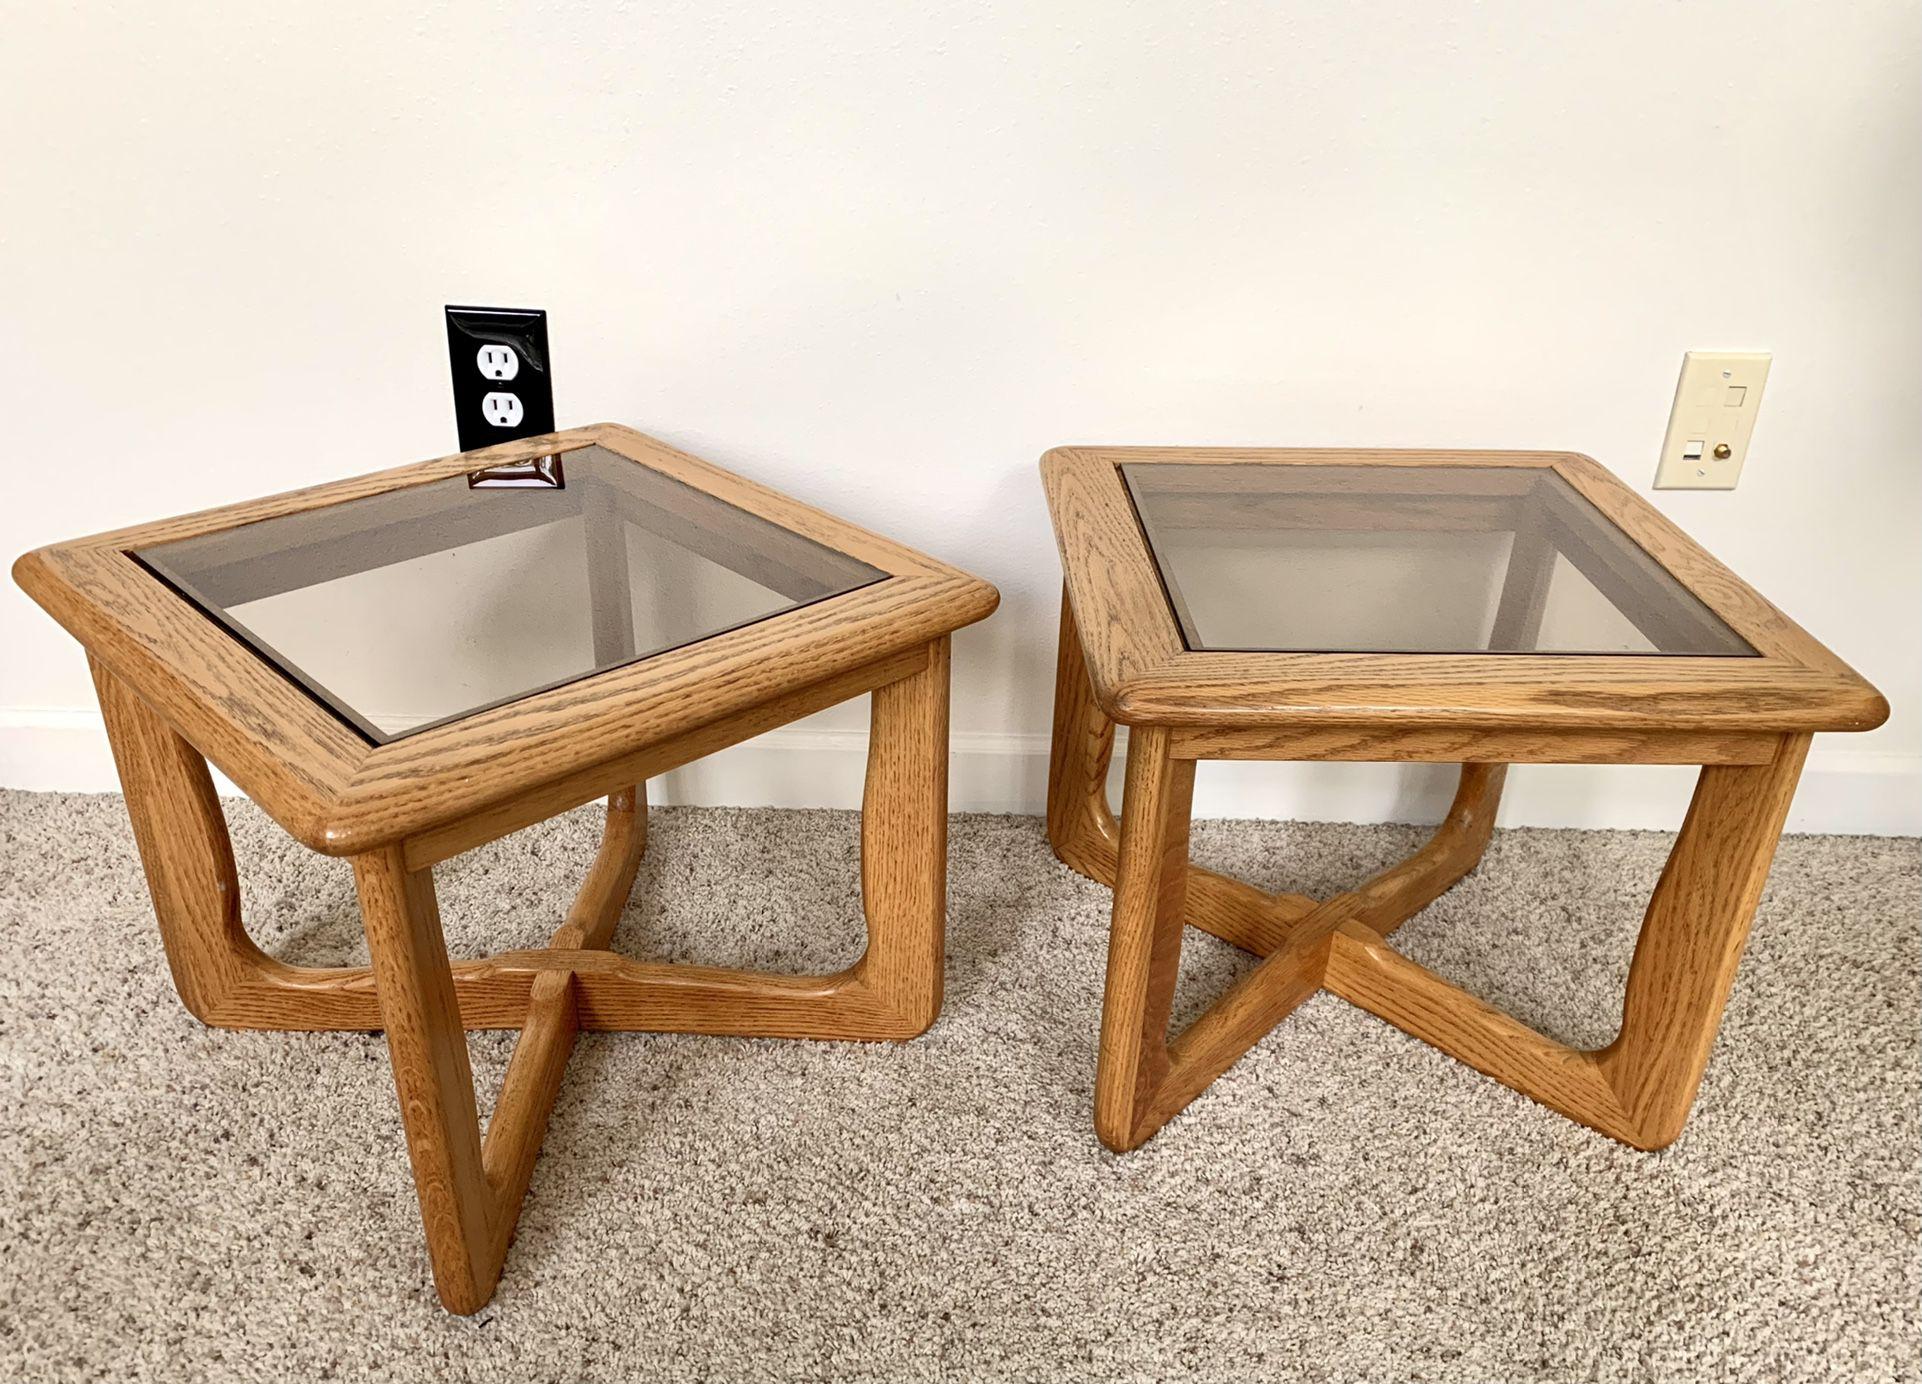 • vintage retro deco wood + smokey glass accent tables •